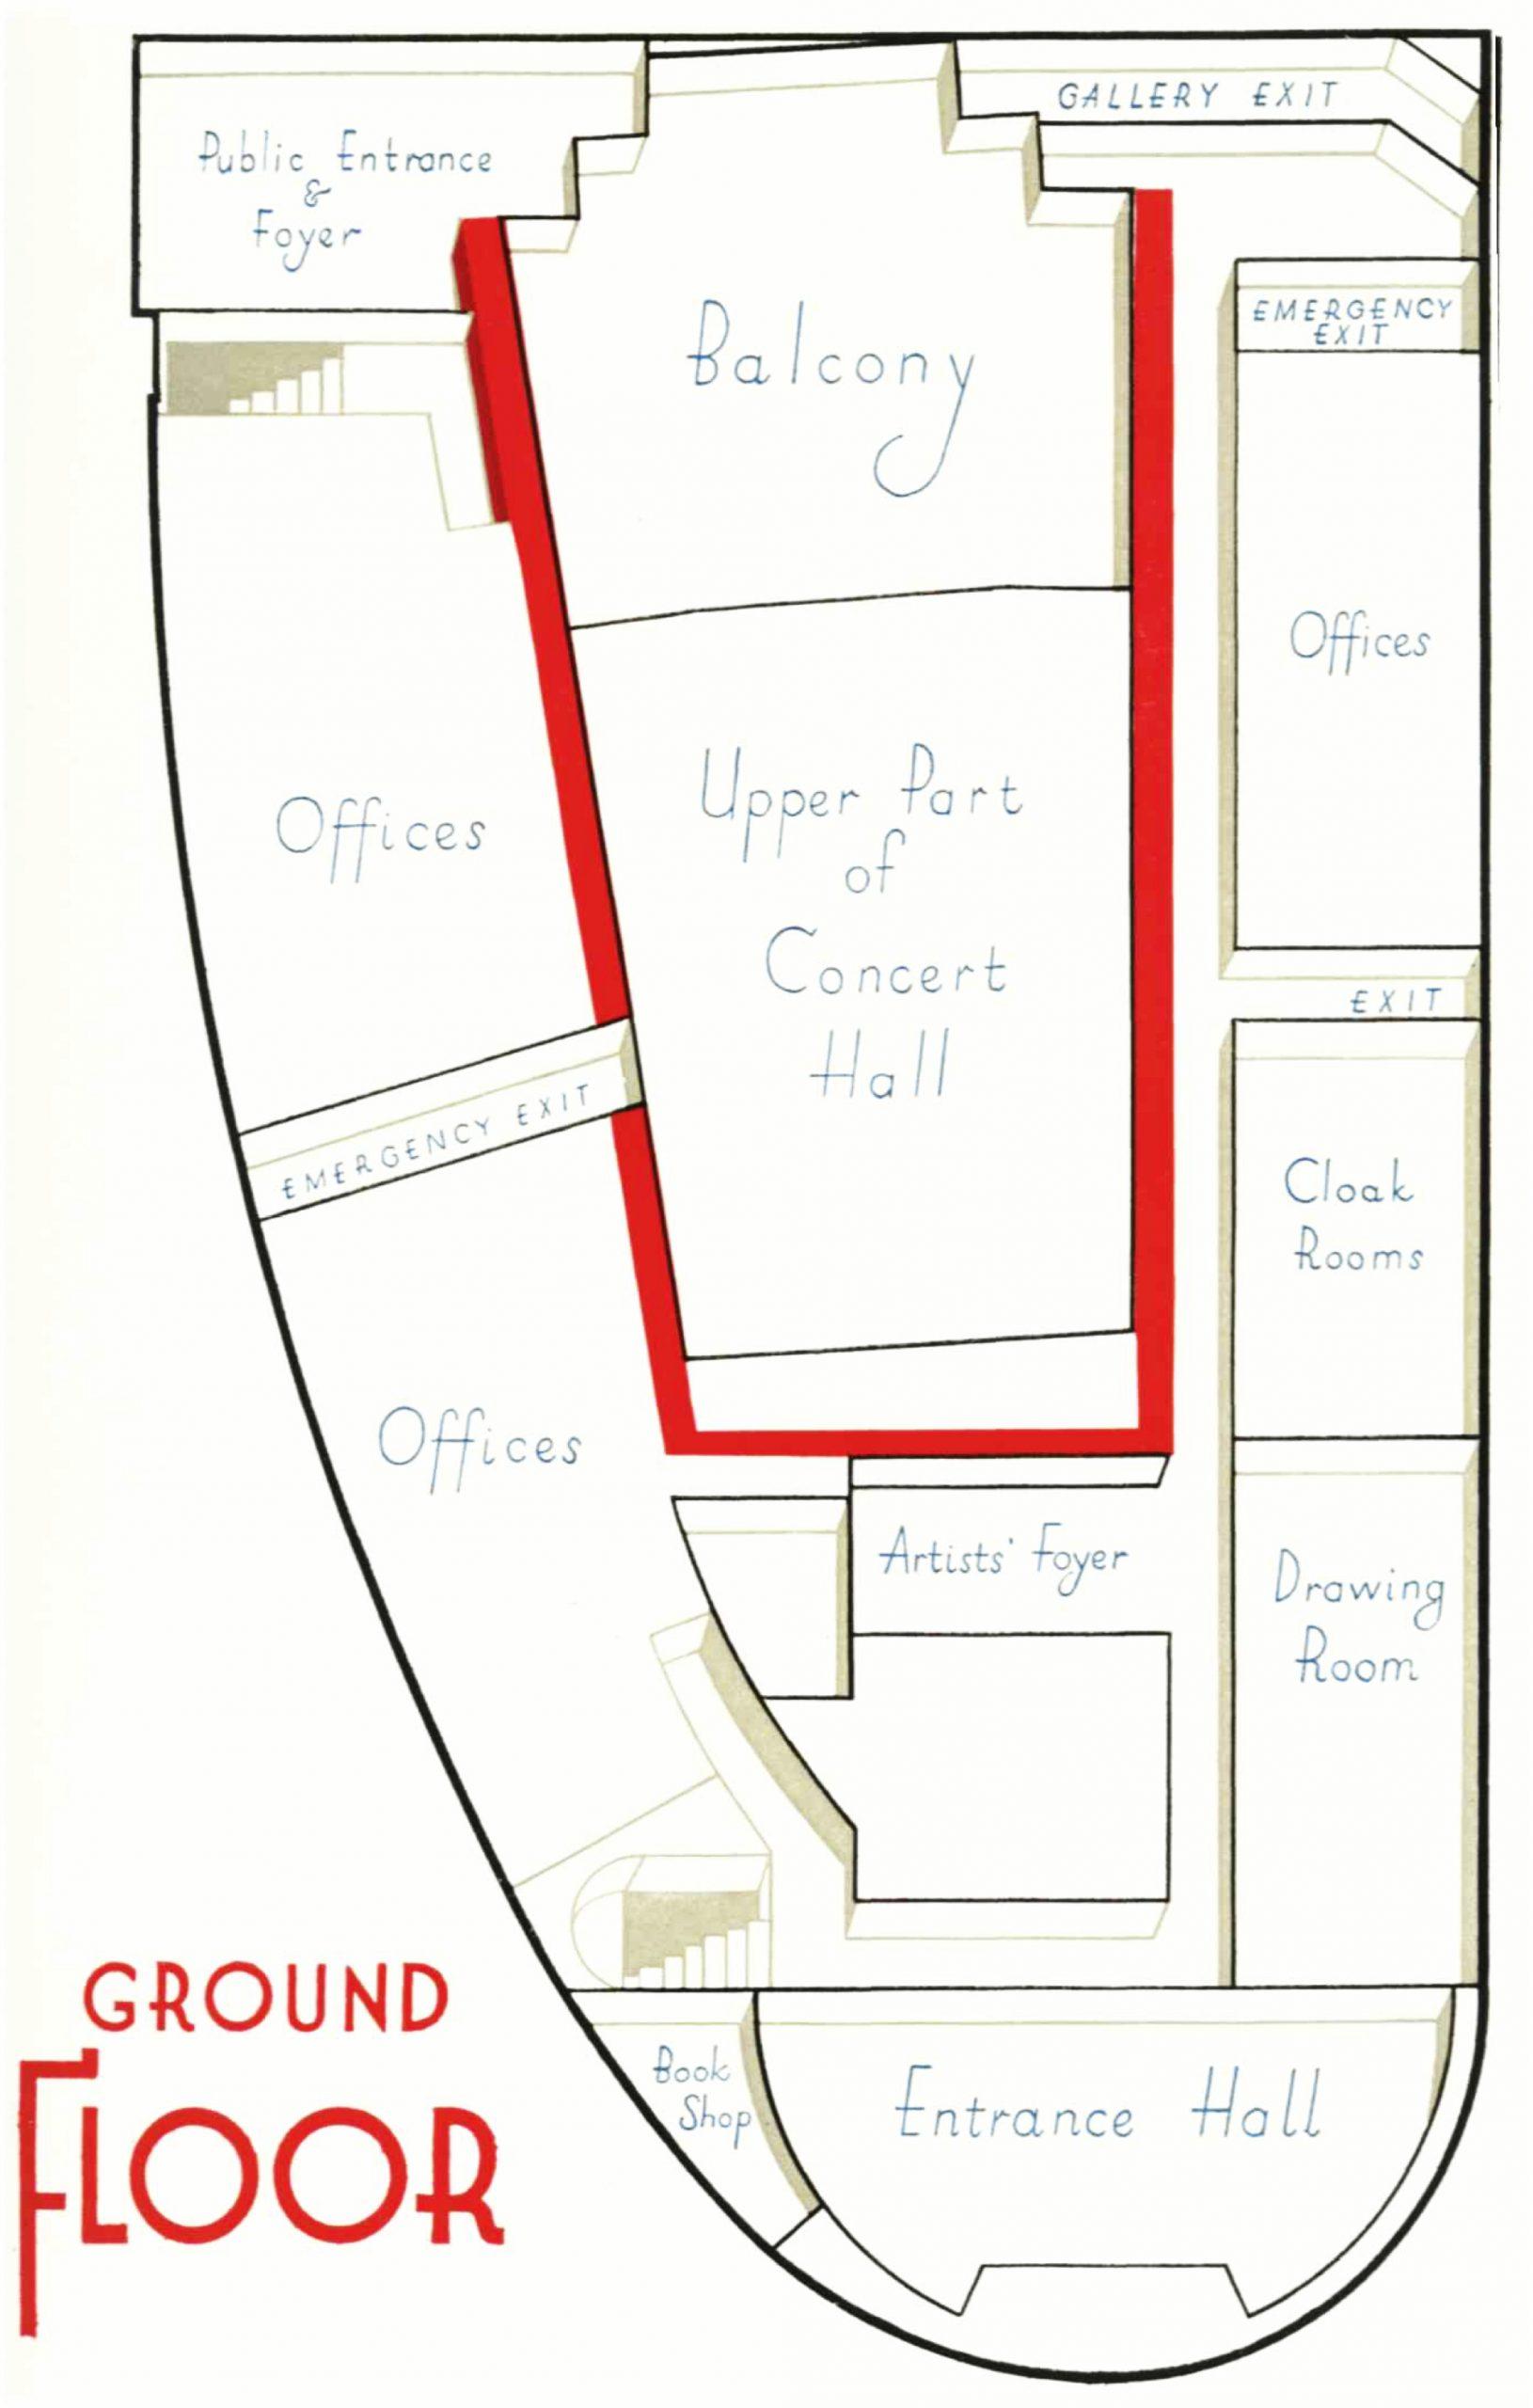 Diagram of the ground floor